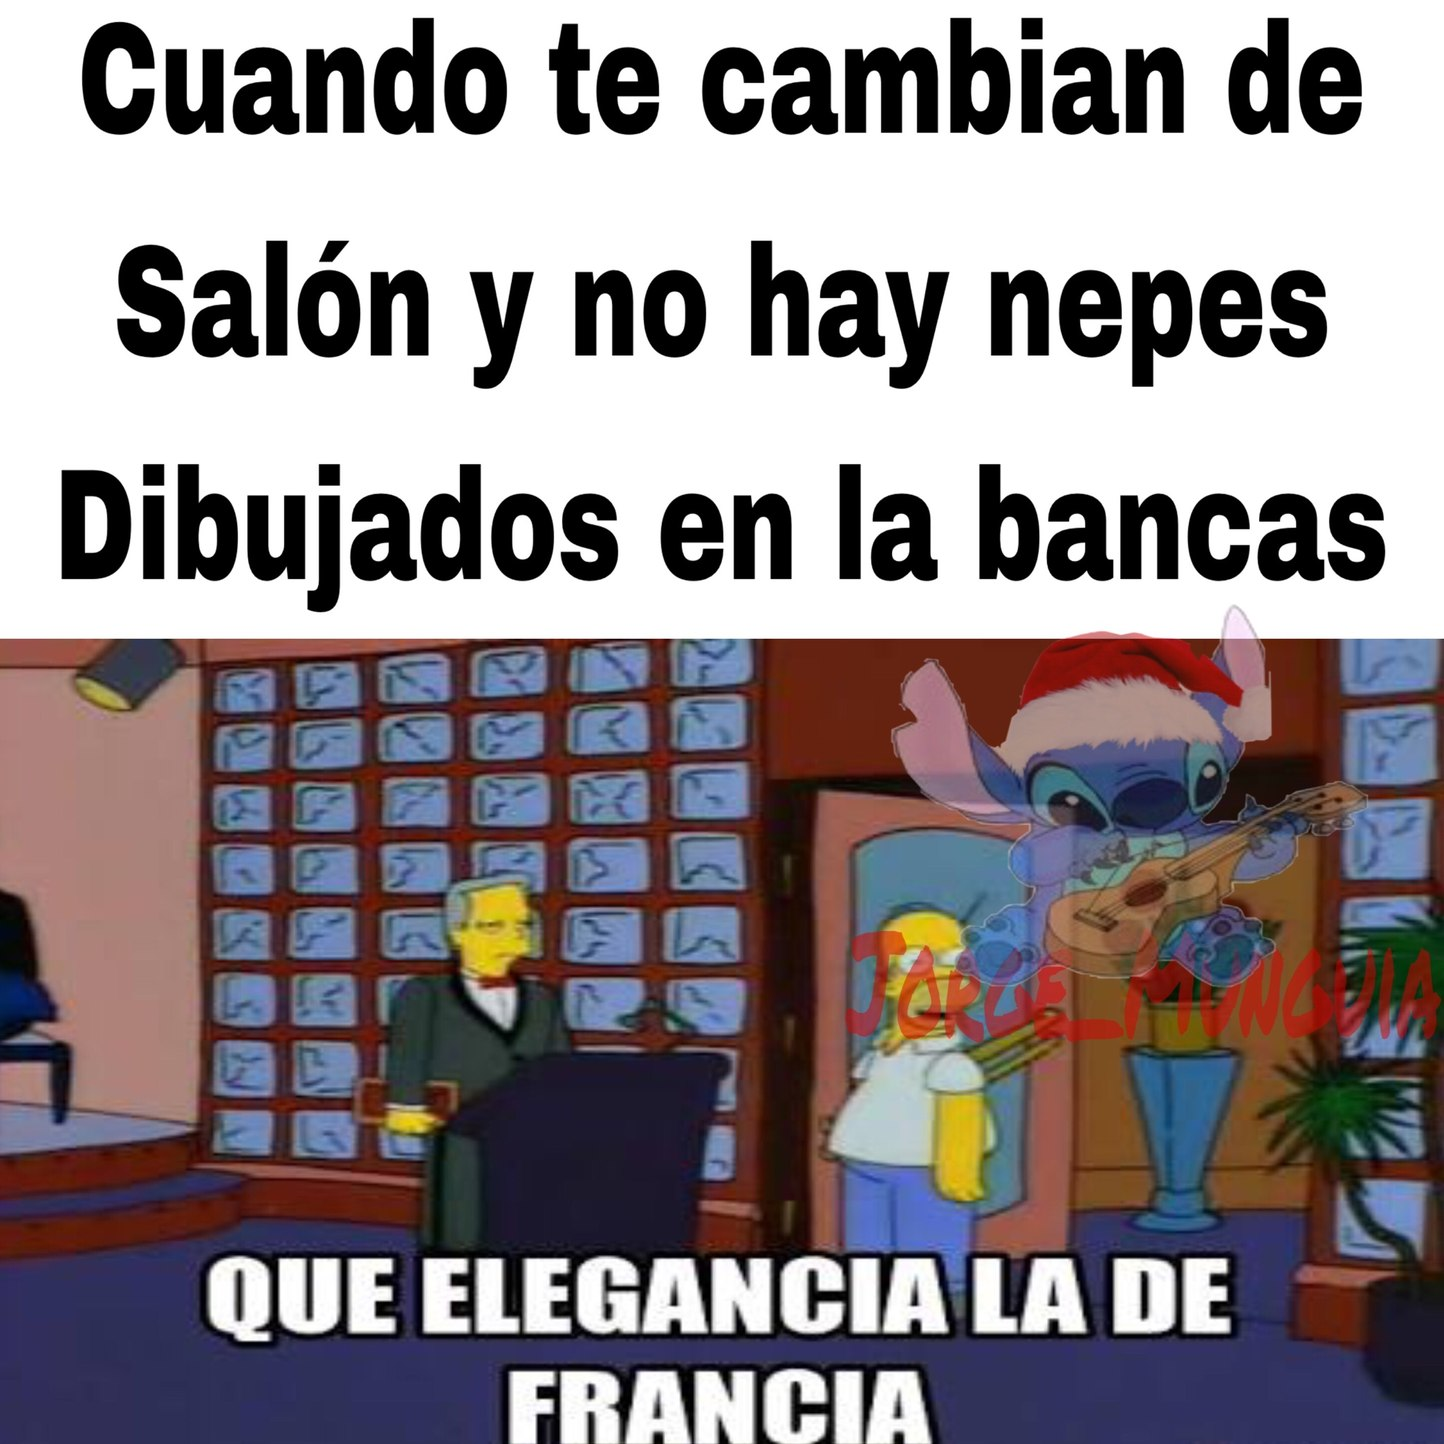 elegancia <3 - meme